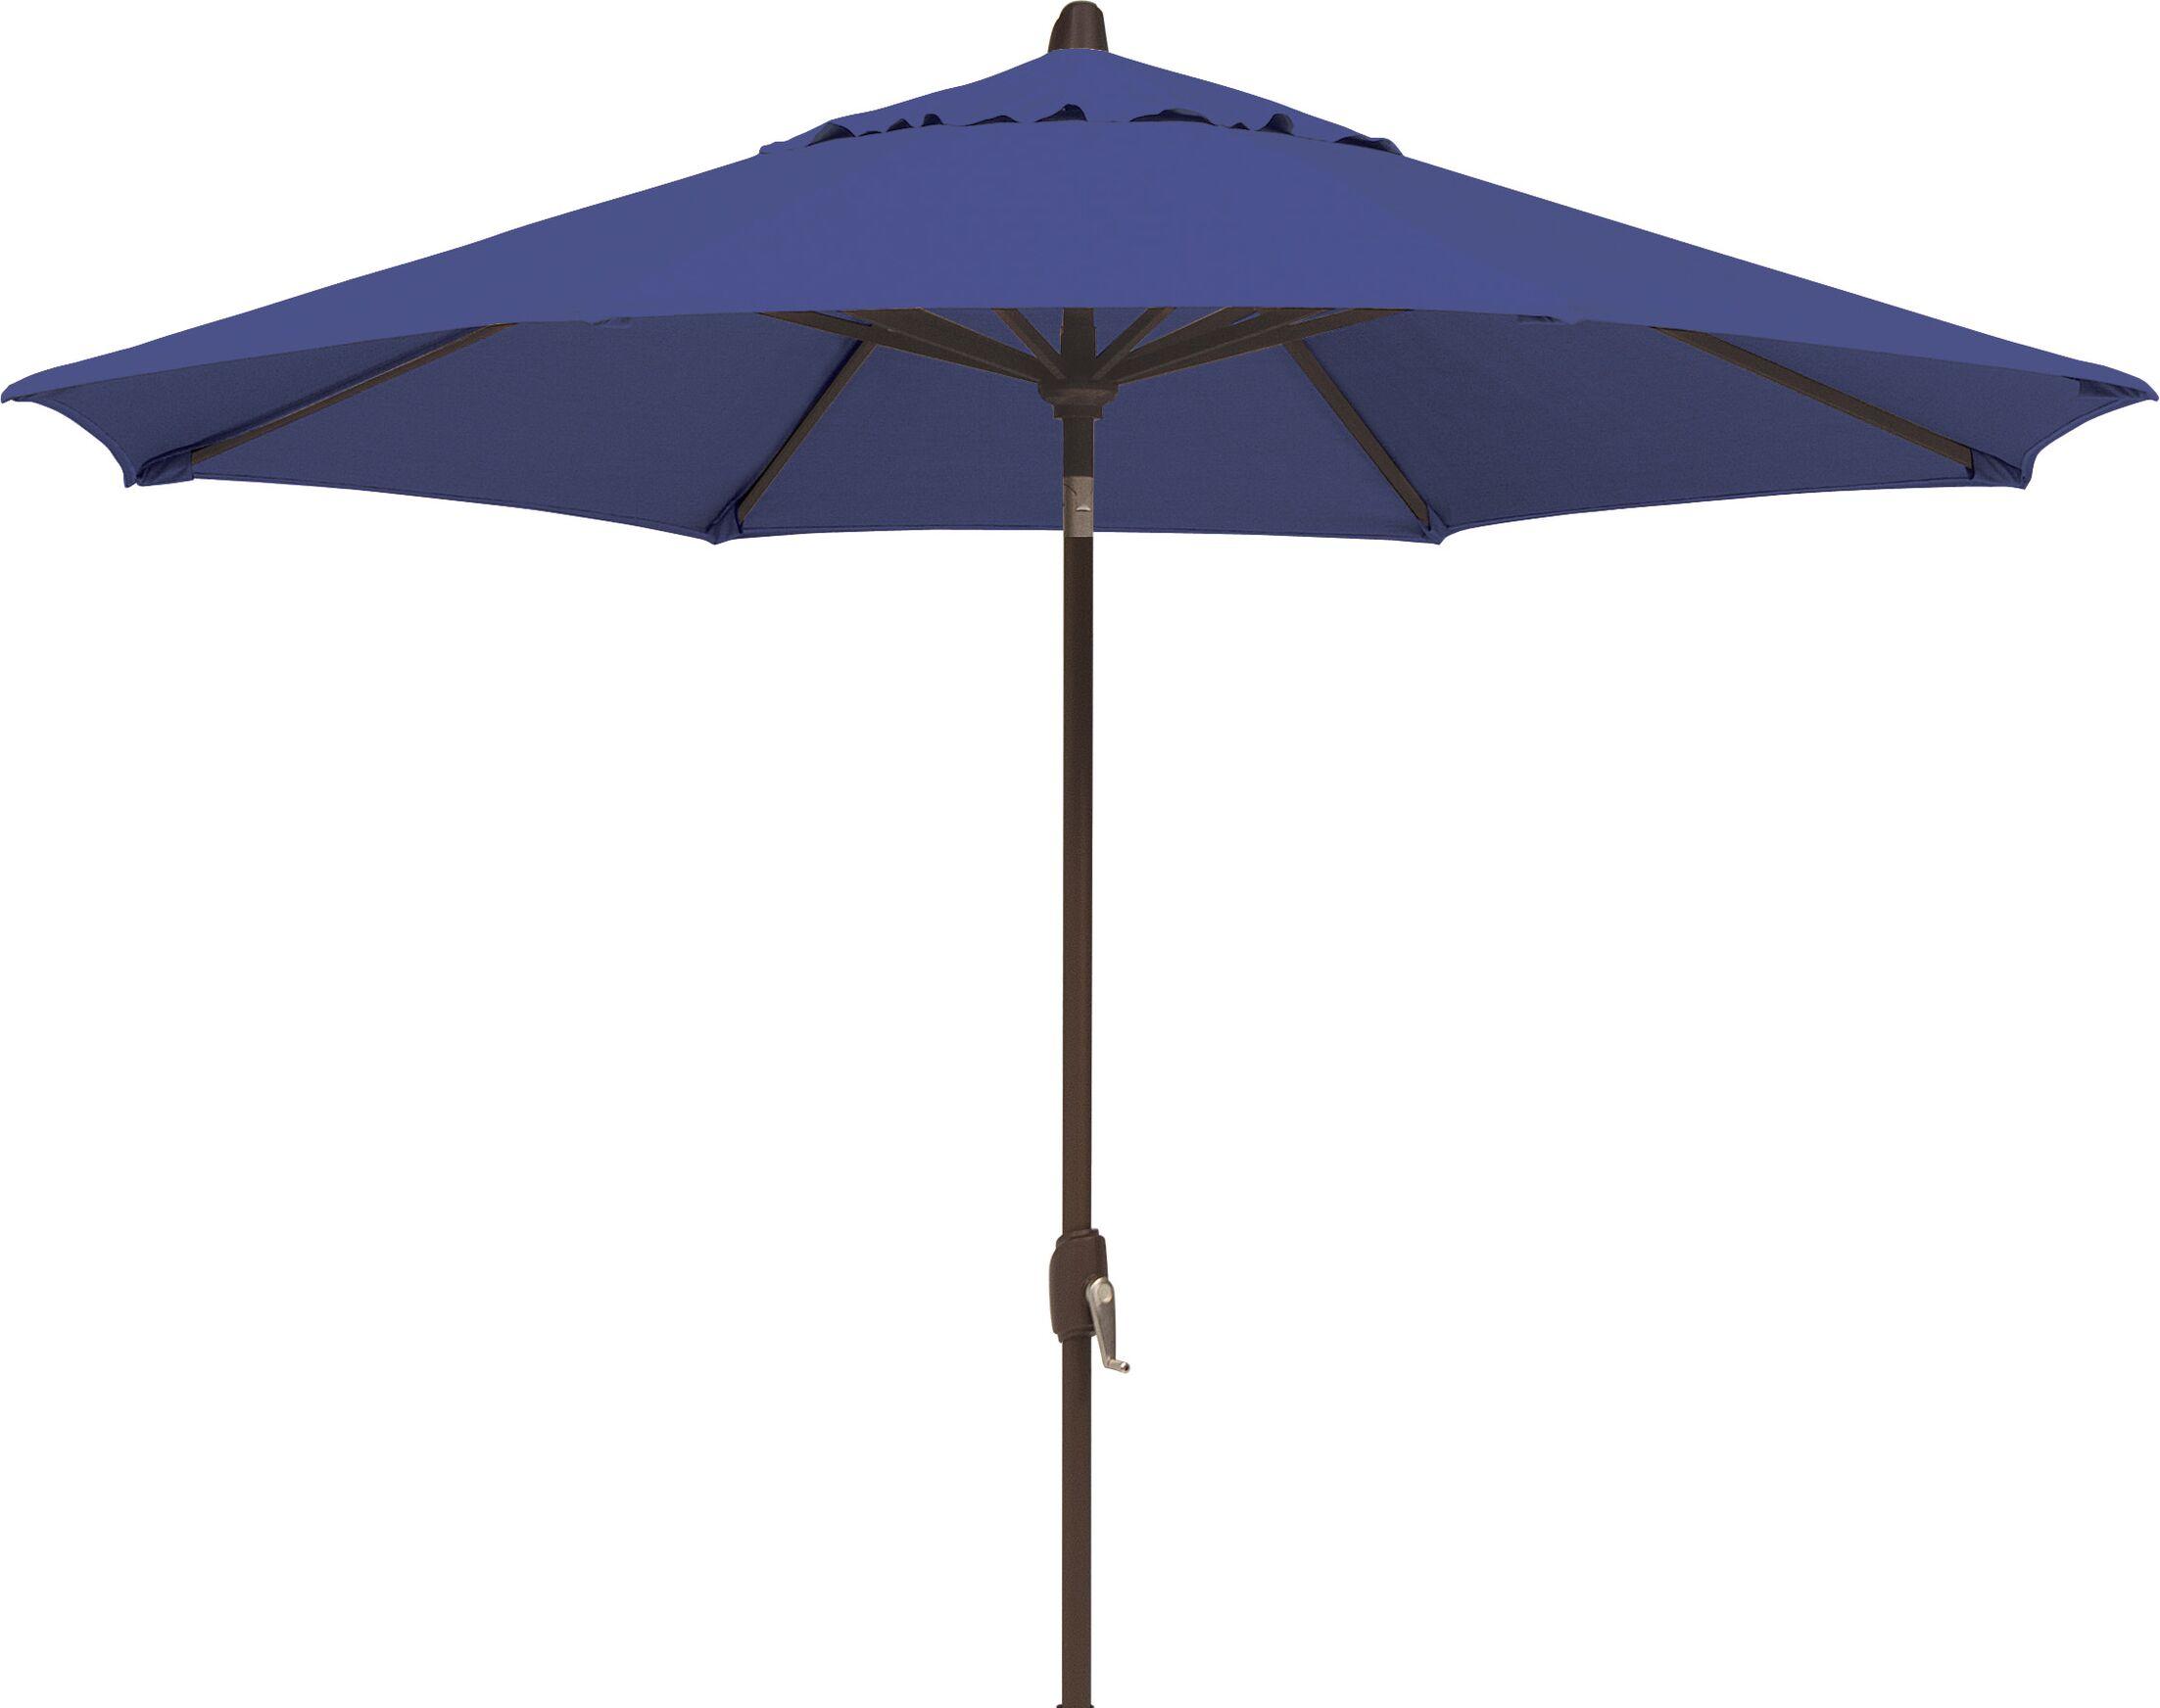 Lanai 9' Market Umbrella Fabric: Solefin / Sky Blue